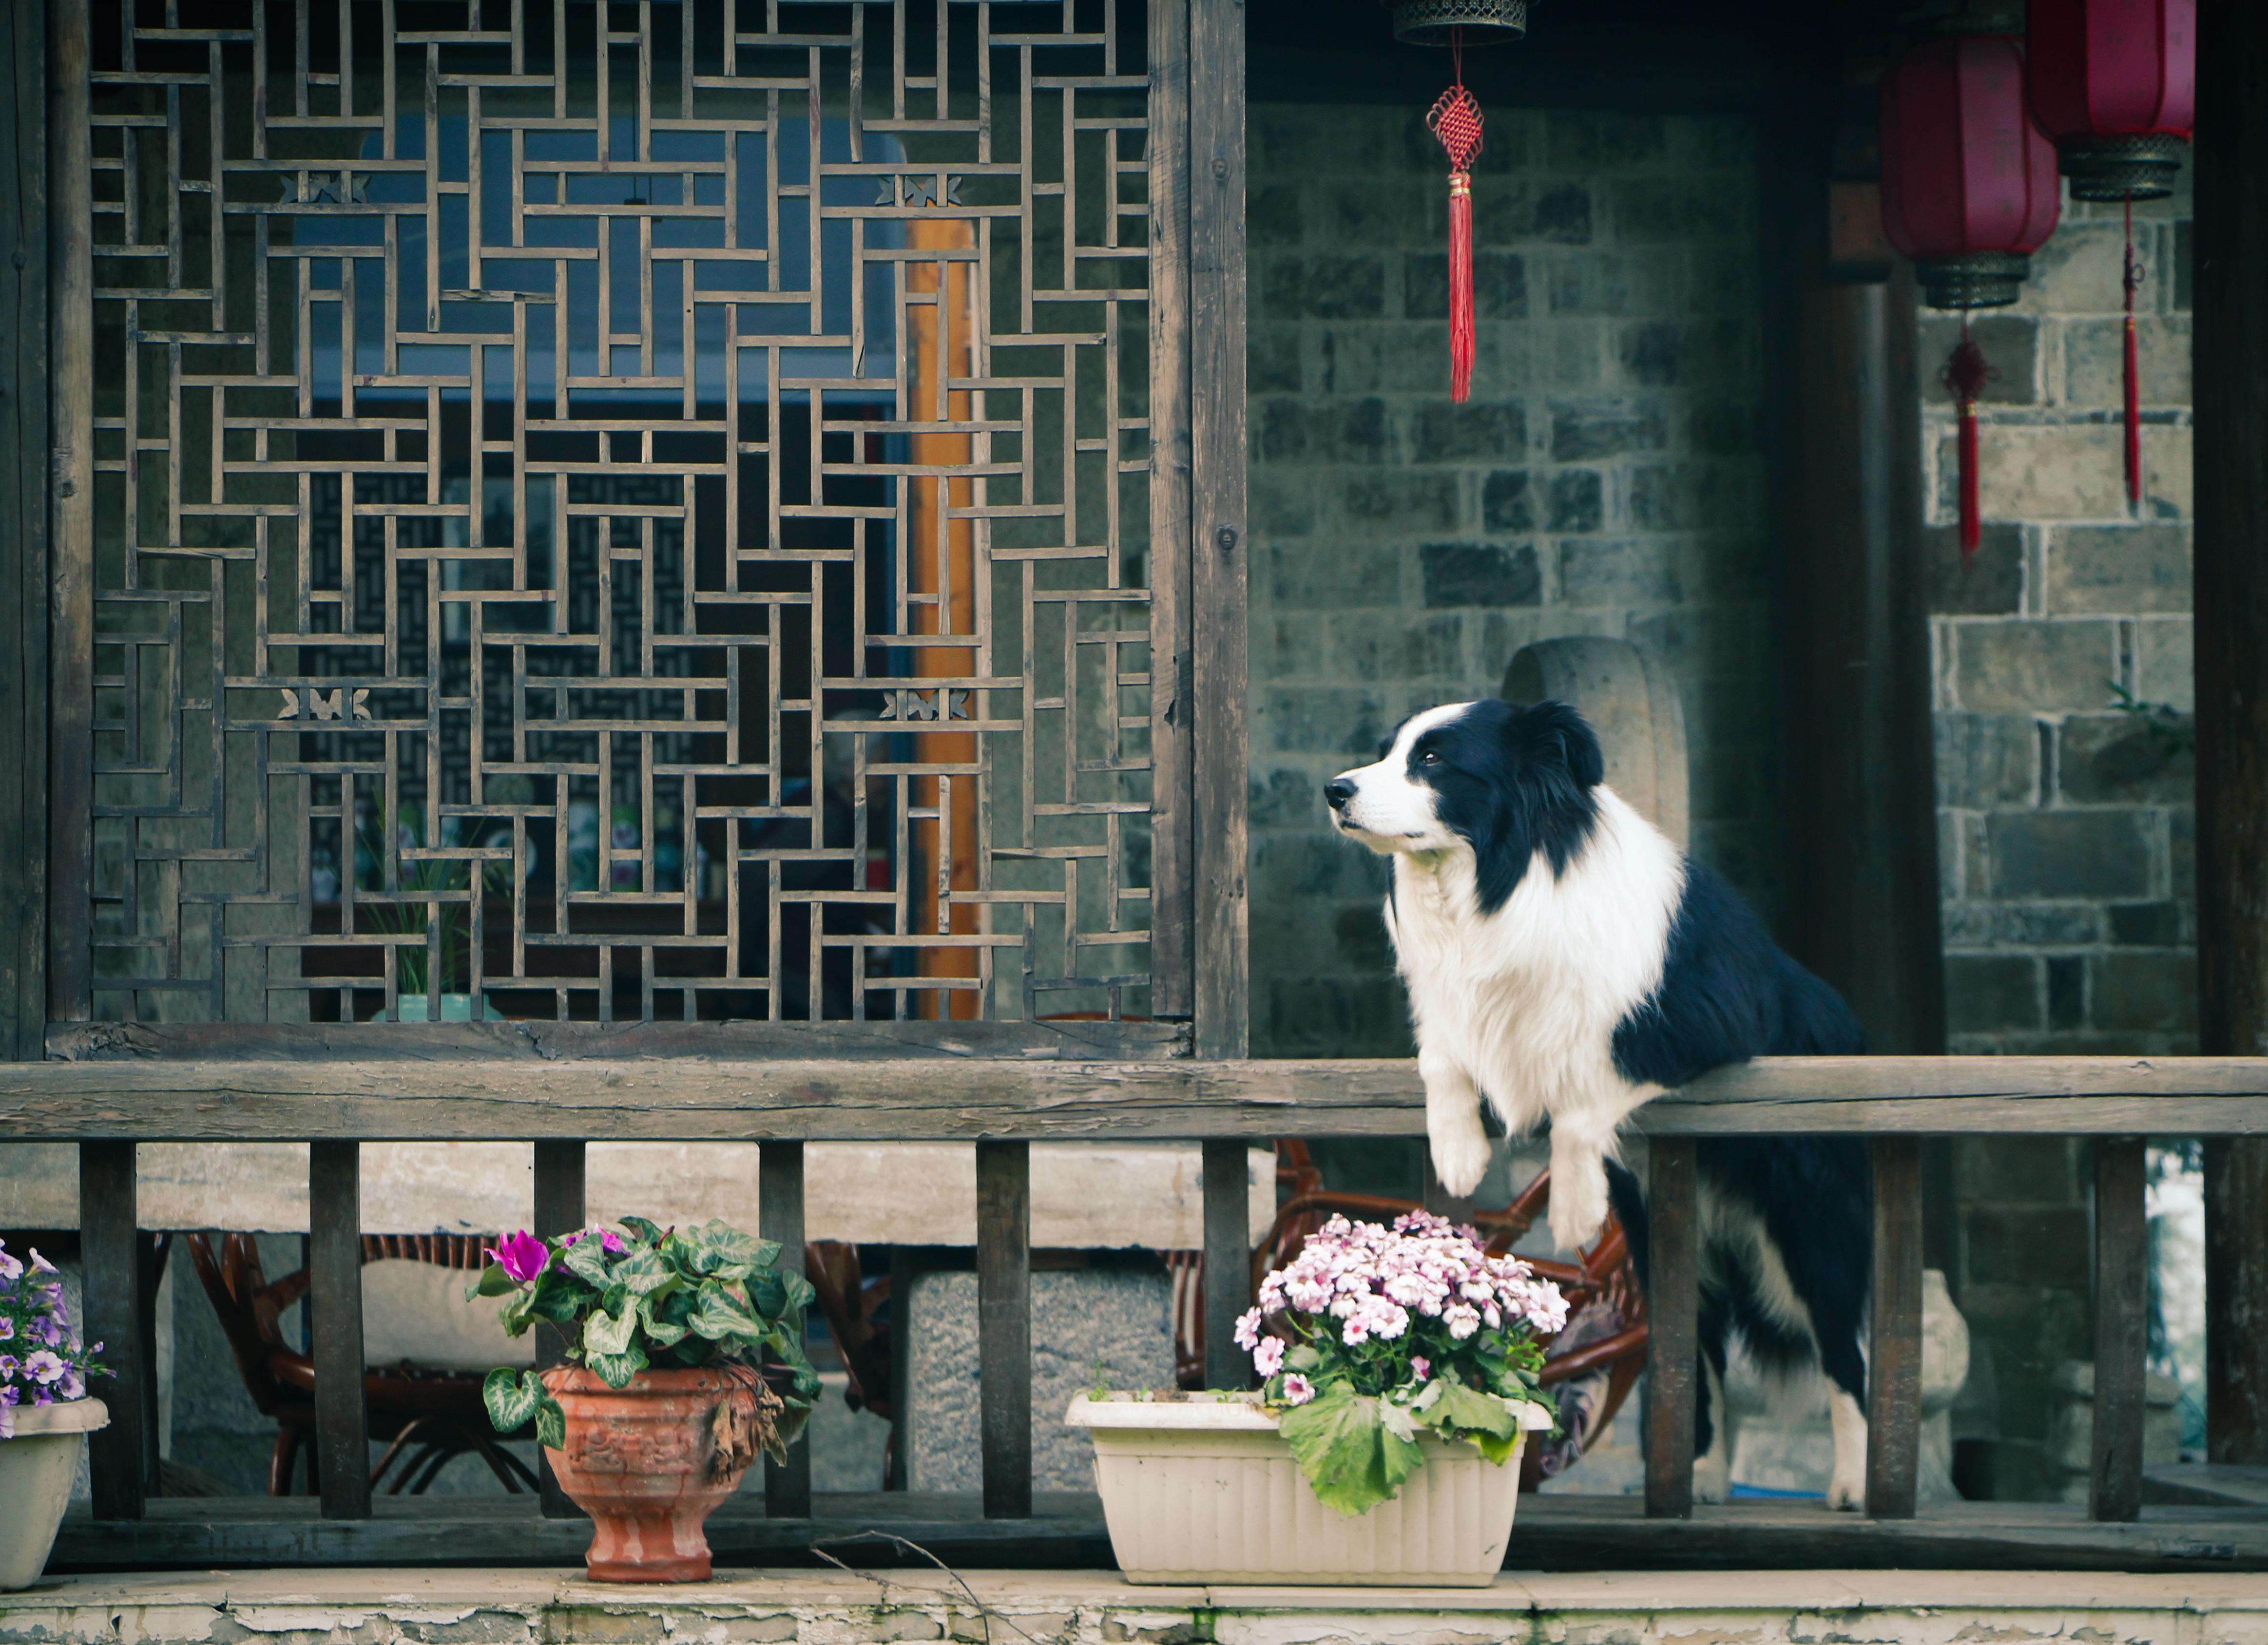 Free stock photo of flowers, house, dog, window